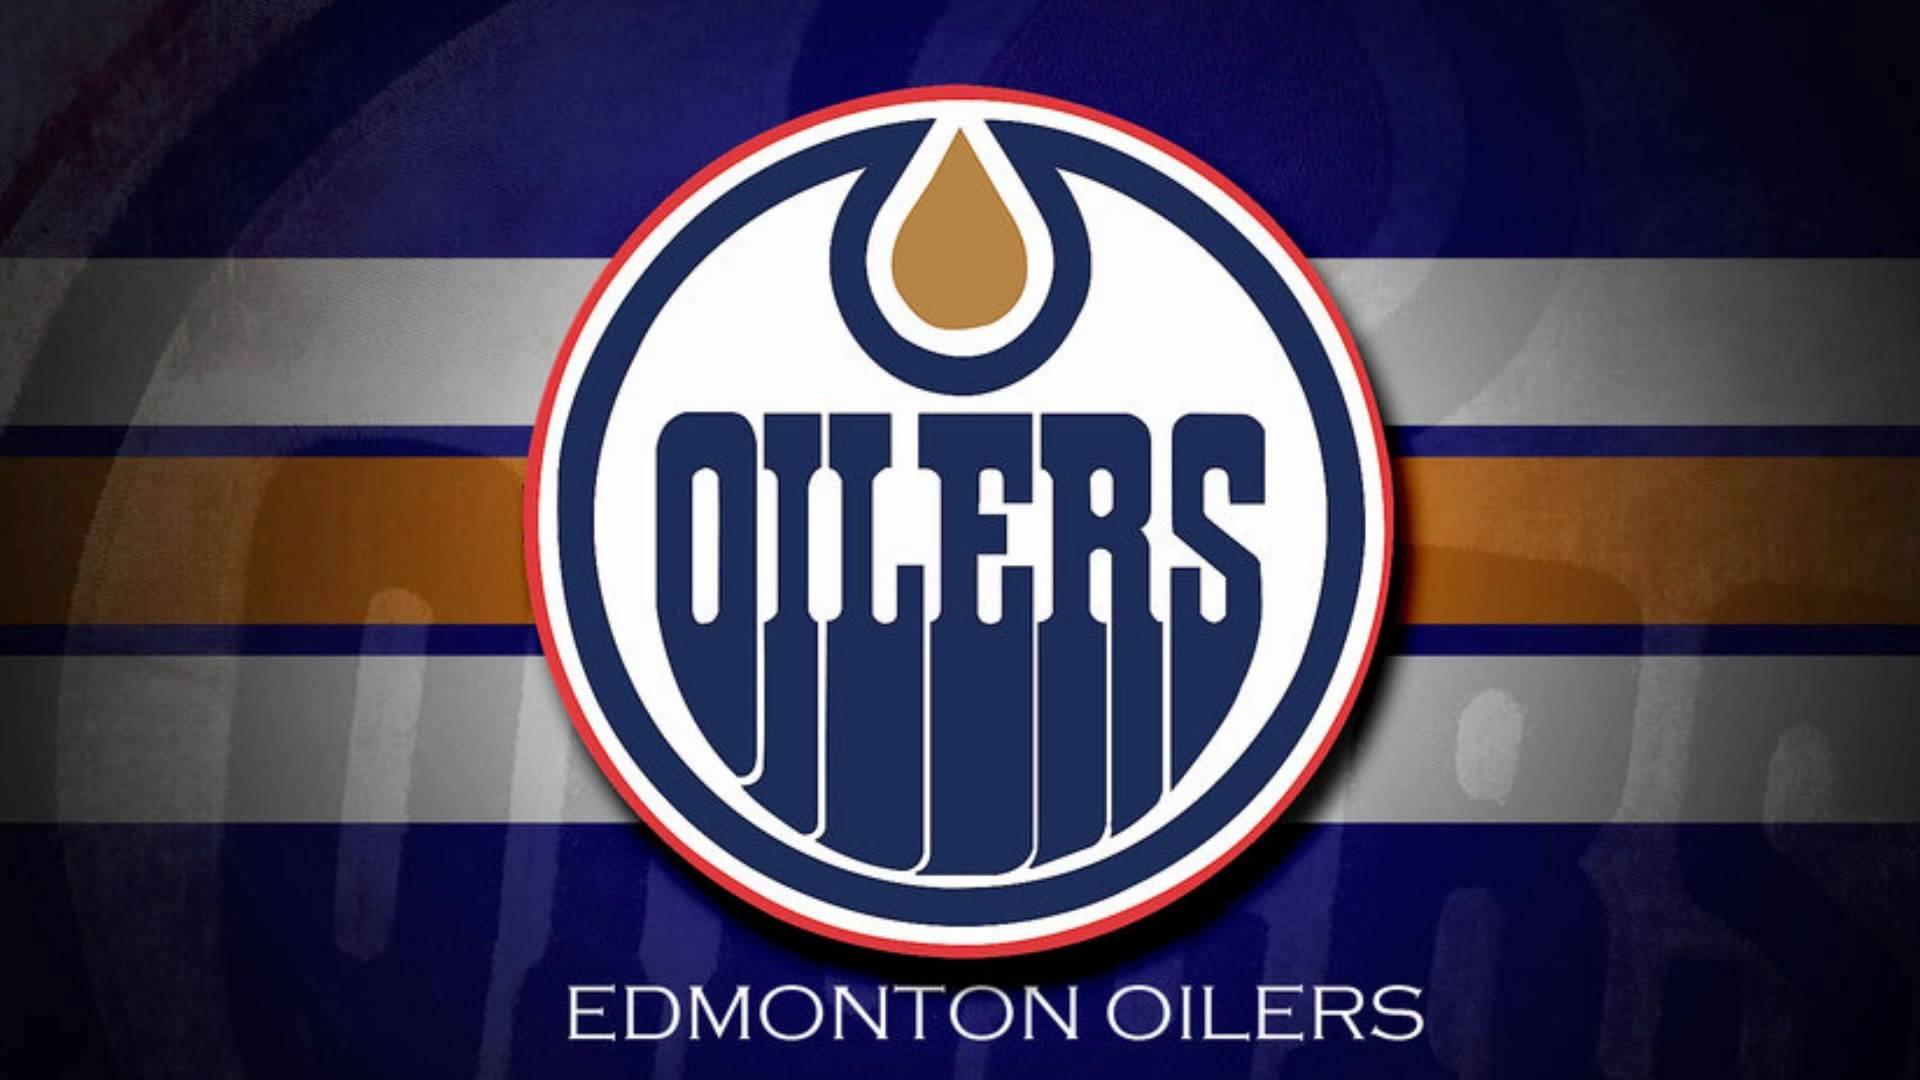 Photo Wall Murals Edmonton Oilers Nhl Hockey 26 Wallpaper 1920x1080